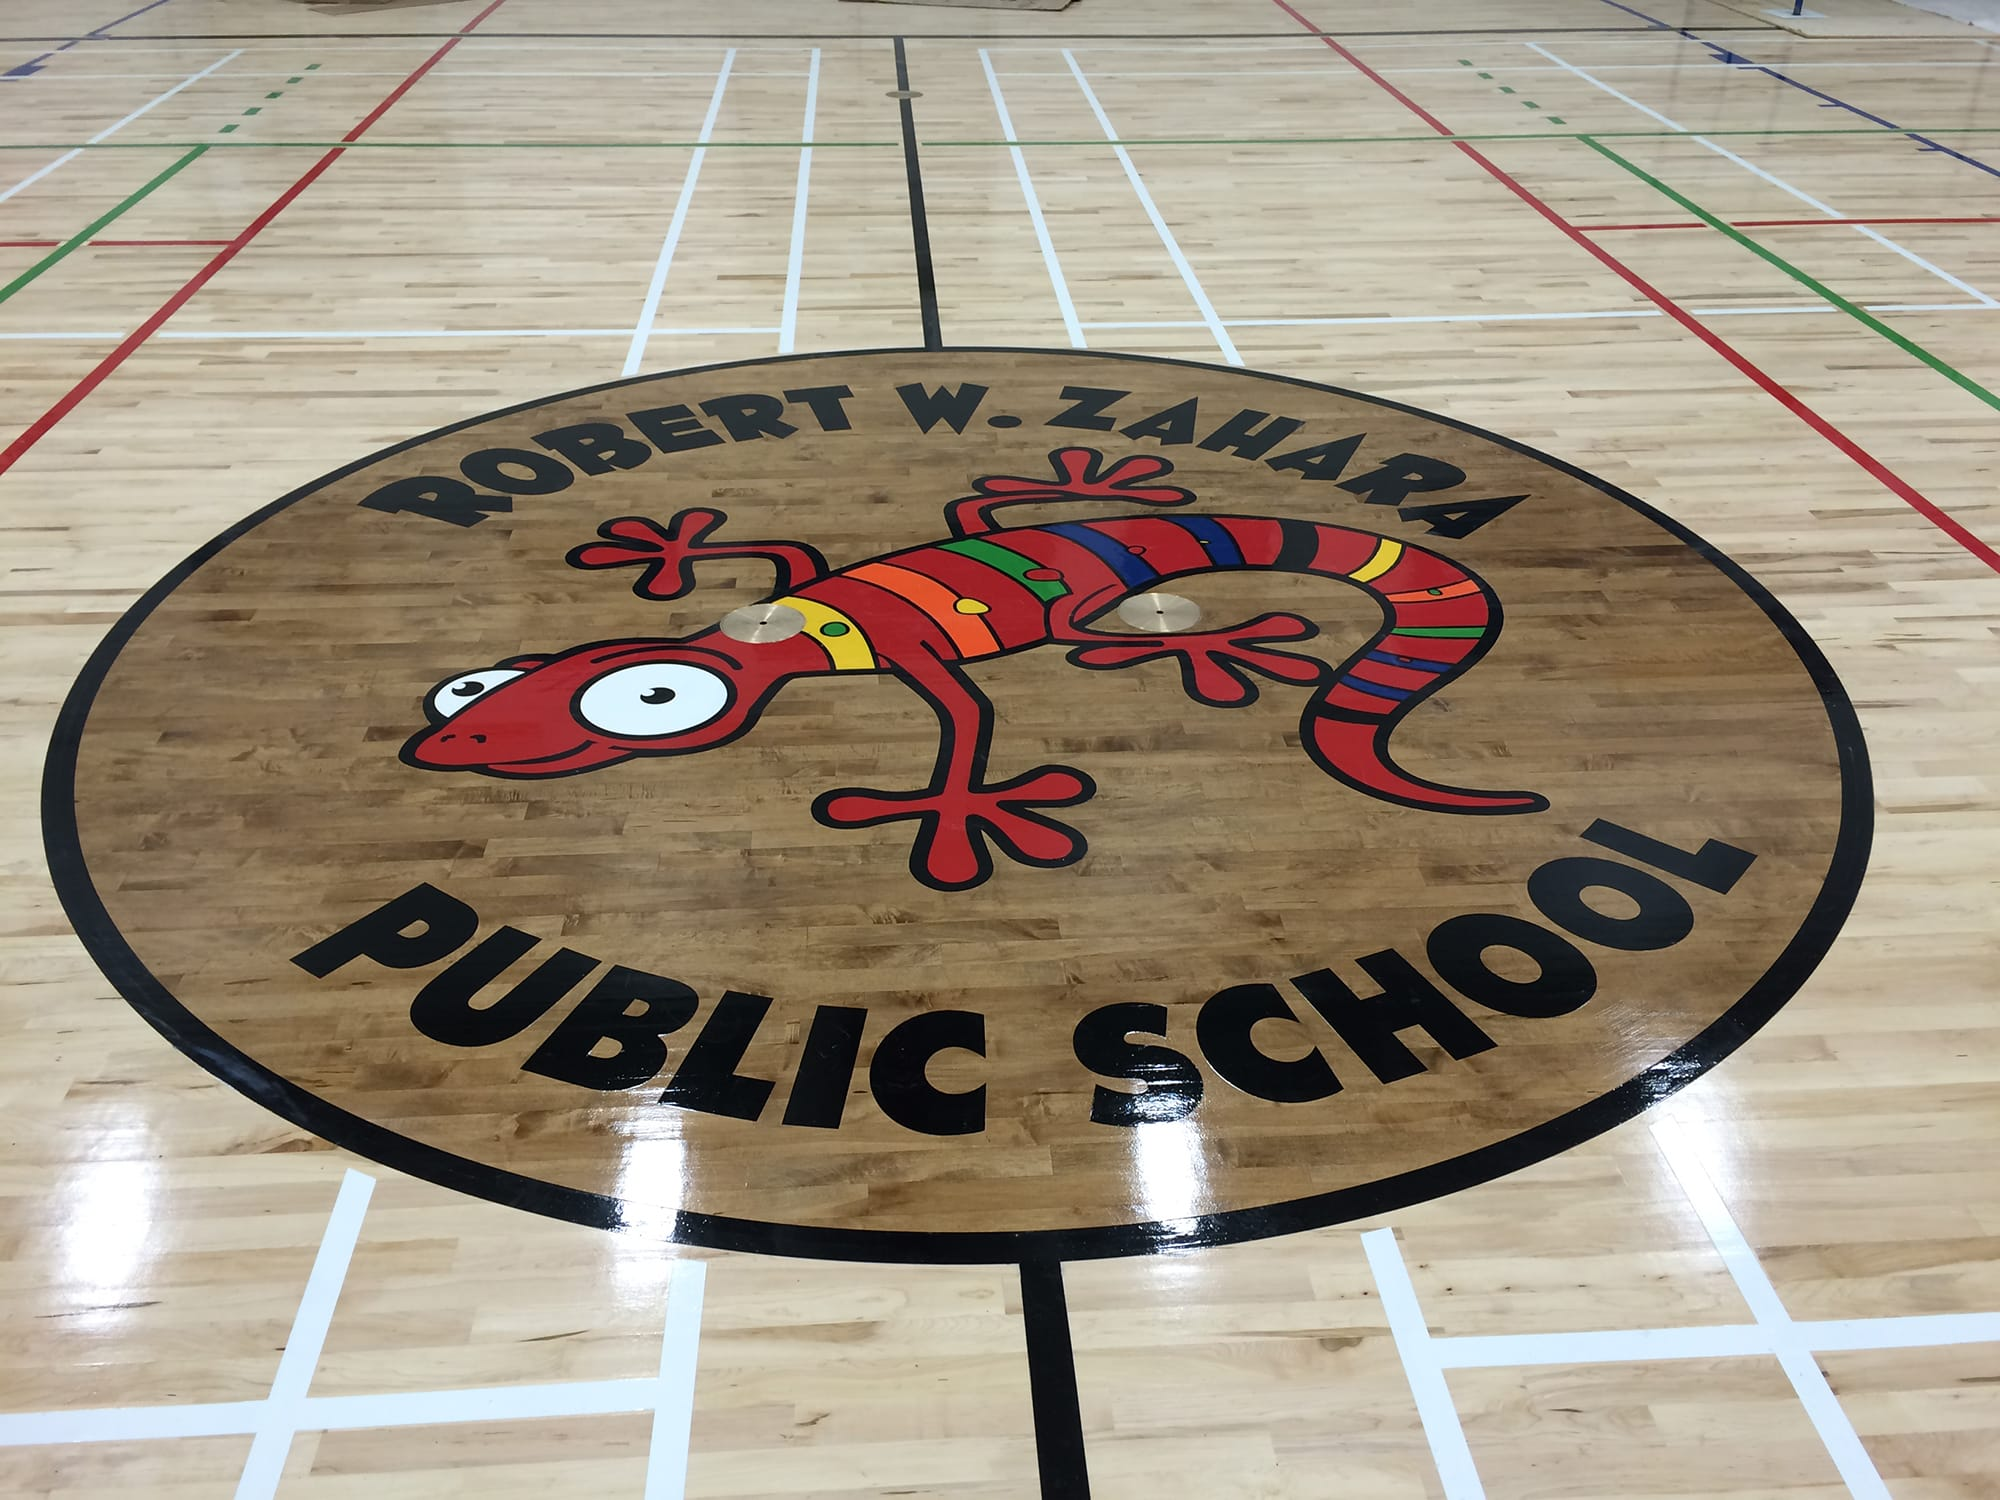 Robert W Zahara Public School interior centre court of the gymnasium